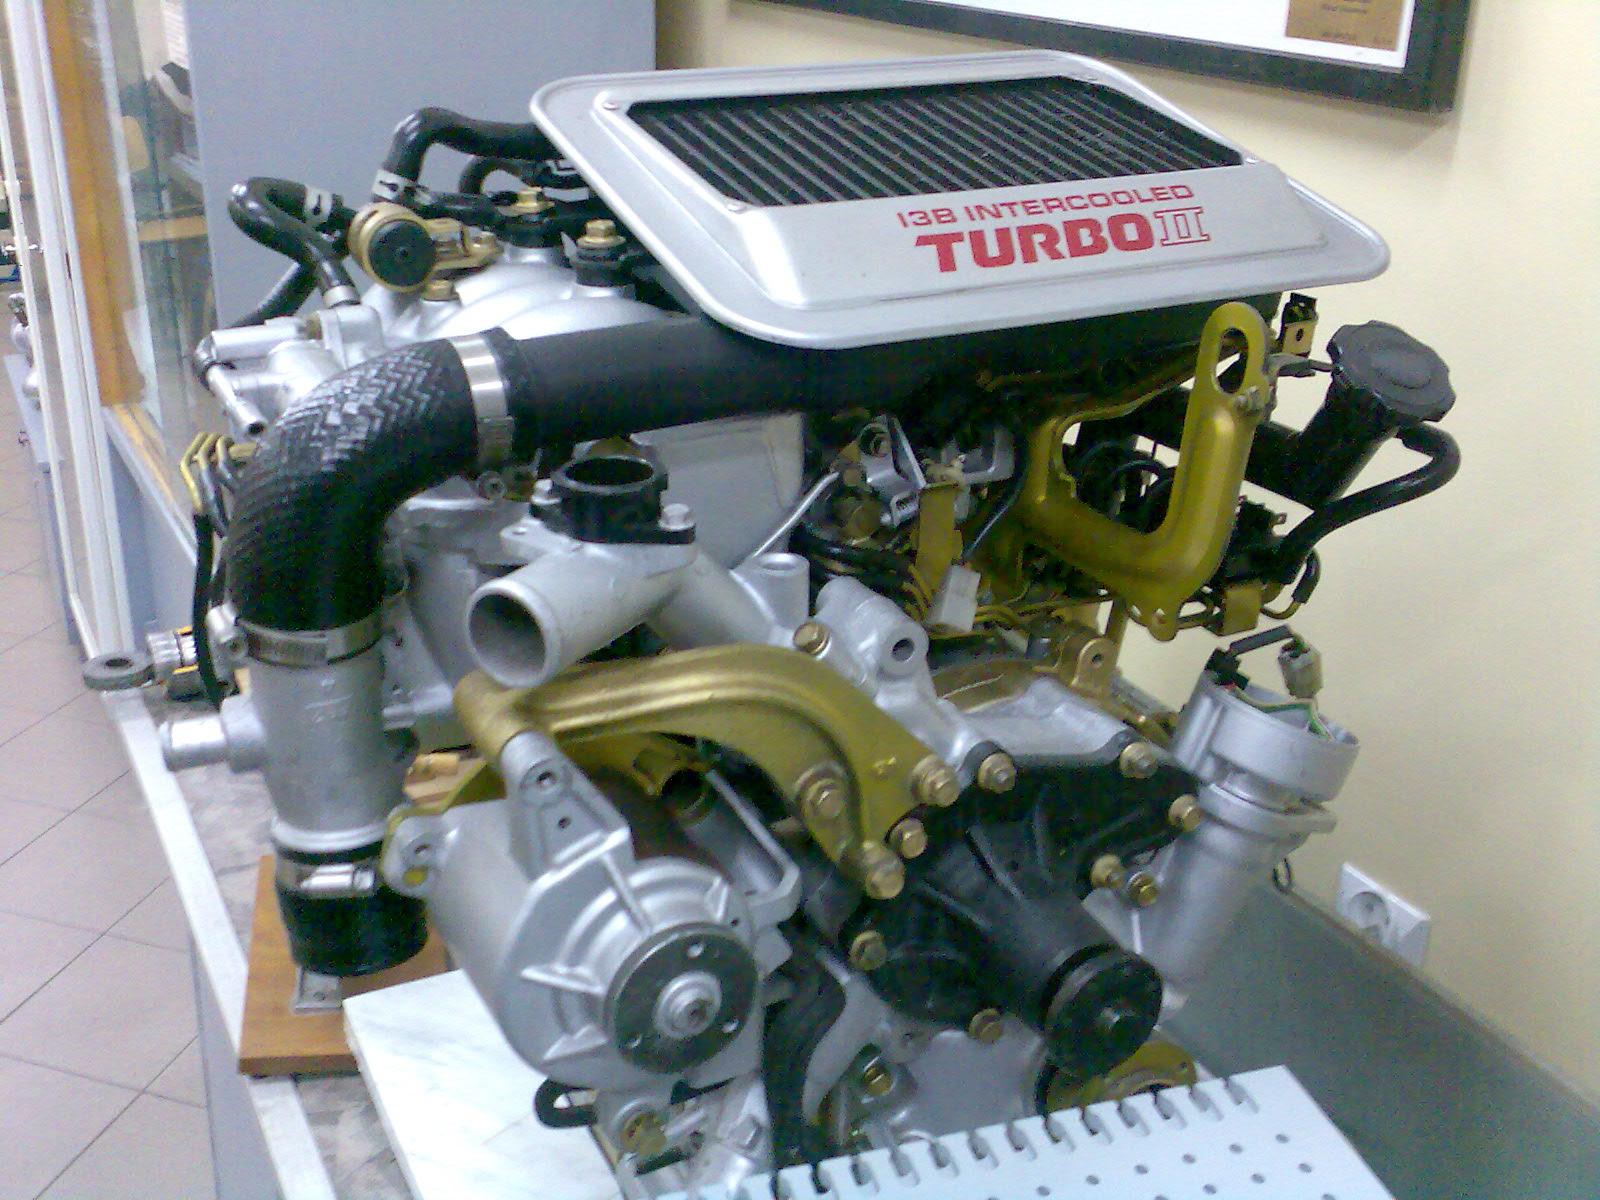 13b Engine 4 Port Vs 6 Port12a Rx7clubcom Mazda Rx7 Forum Diagram By Lewgtr On Deviantart